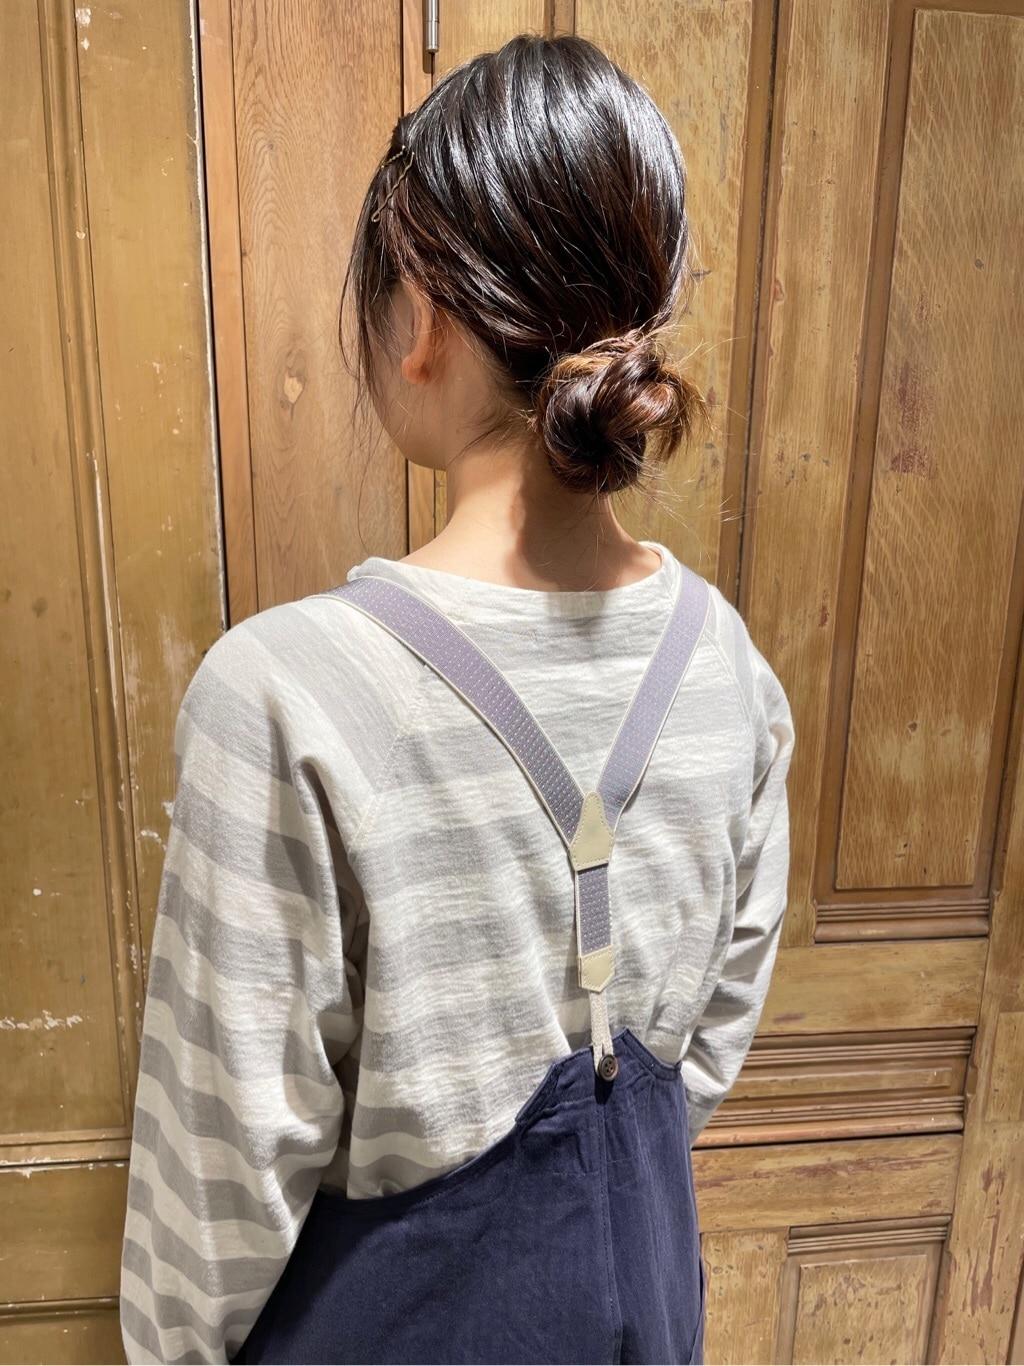 Malle chambre de charme ルミネ新宿 身長:163cm 2021.03.25